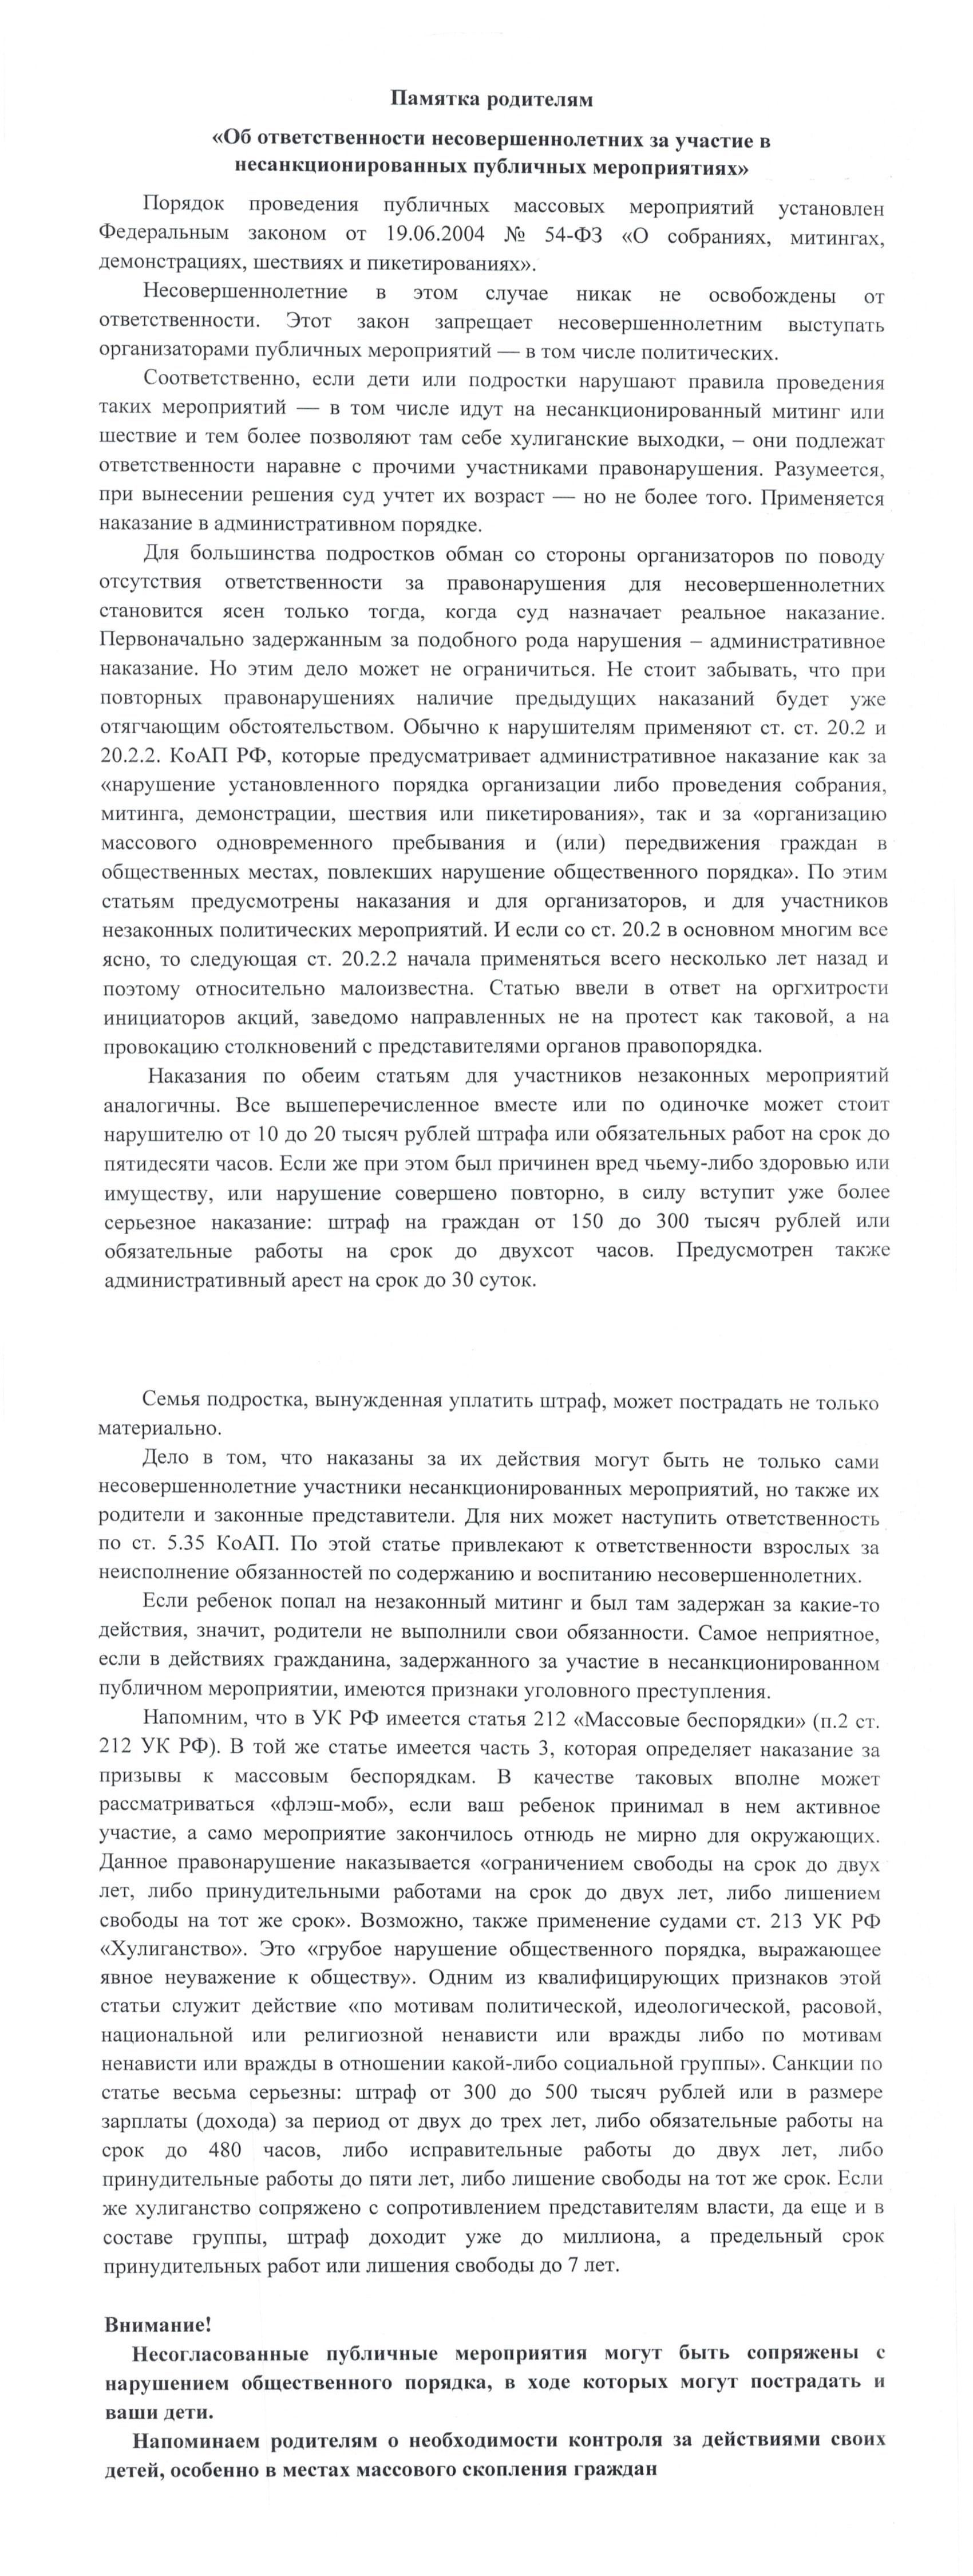 http://edupk.ru/upload/edupk/information_system_547/3/8/9/5/2/item_38952/item_38952.jpg?rnd=1201748045